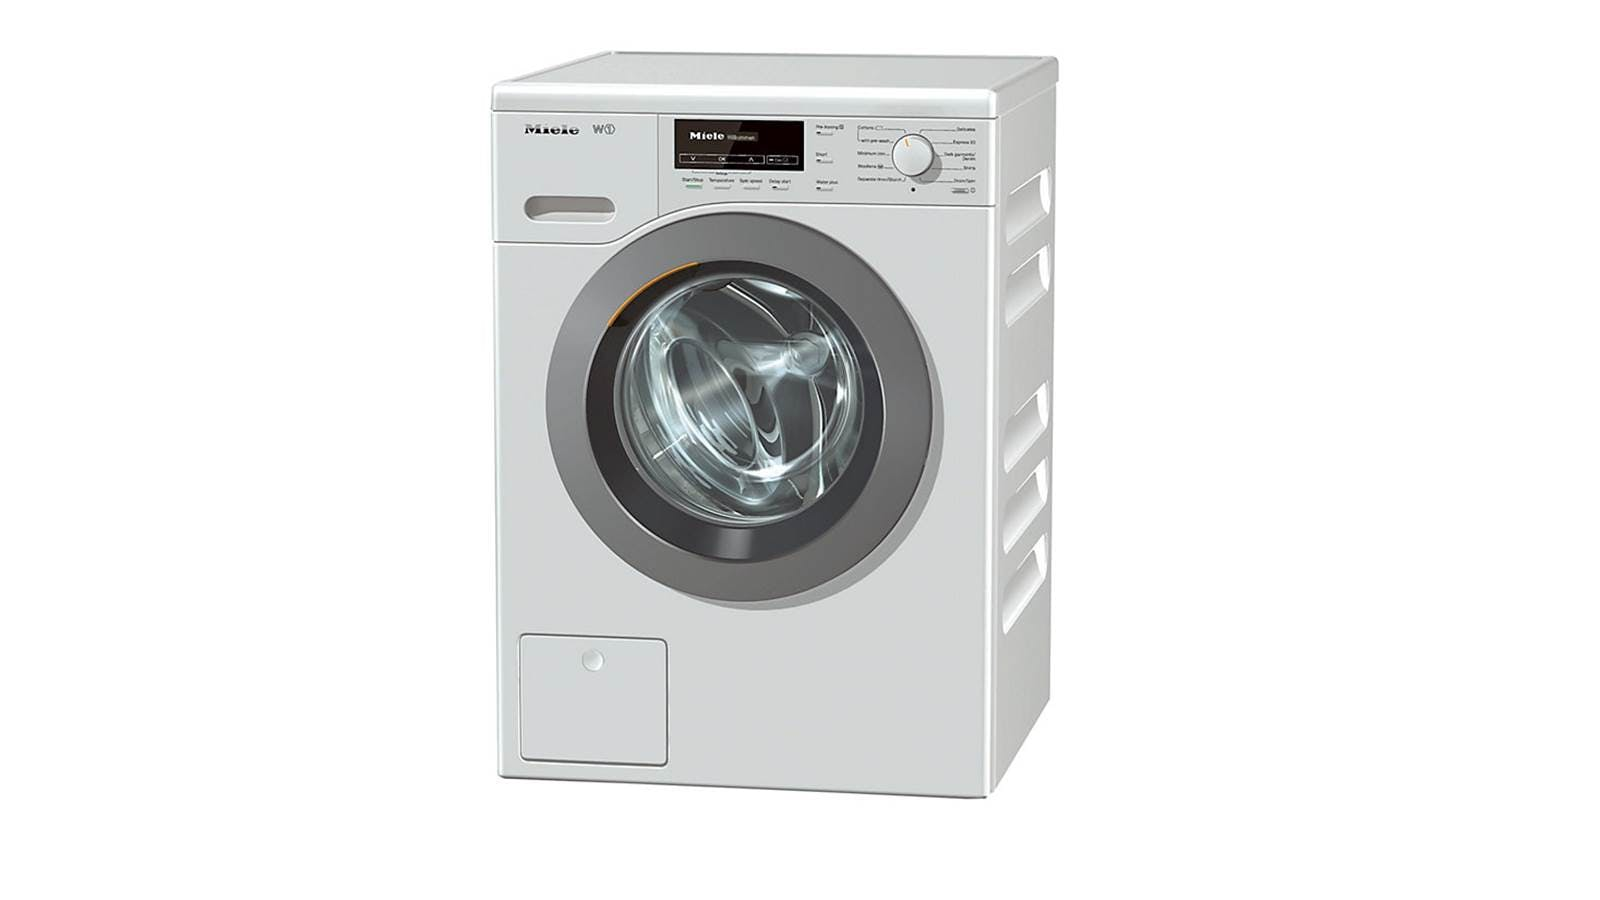 miele wkb120 8kg washing machine harvey norman malaysia. Black Bedroom Furniture Sets. Home Design Ideas